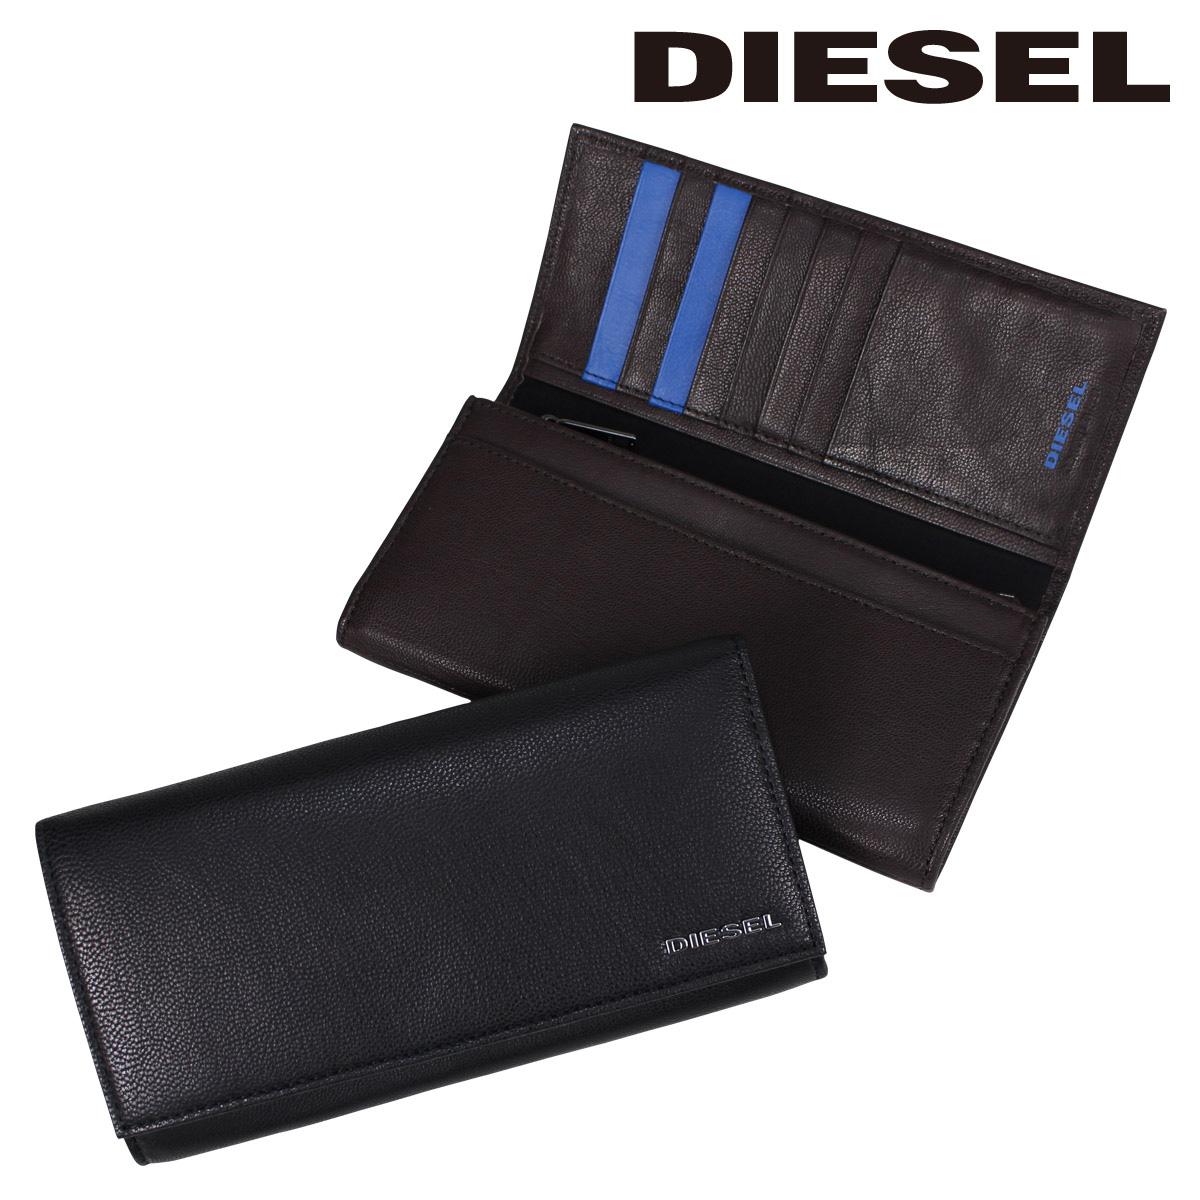 DIESEL 財布 メンズ ディーゼル 長財布 FRESH STARTER 24 A DAY X04457 PR227 ブラック ブラウン